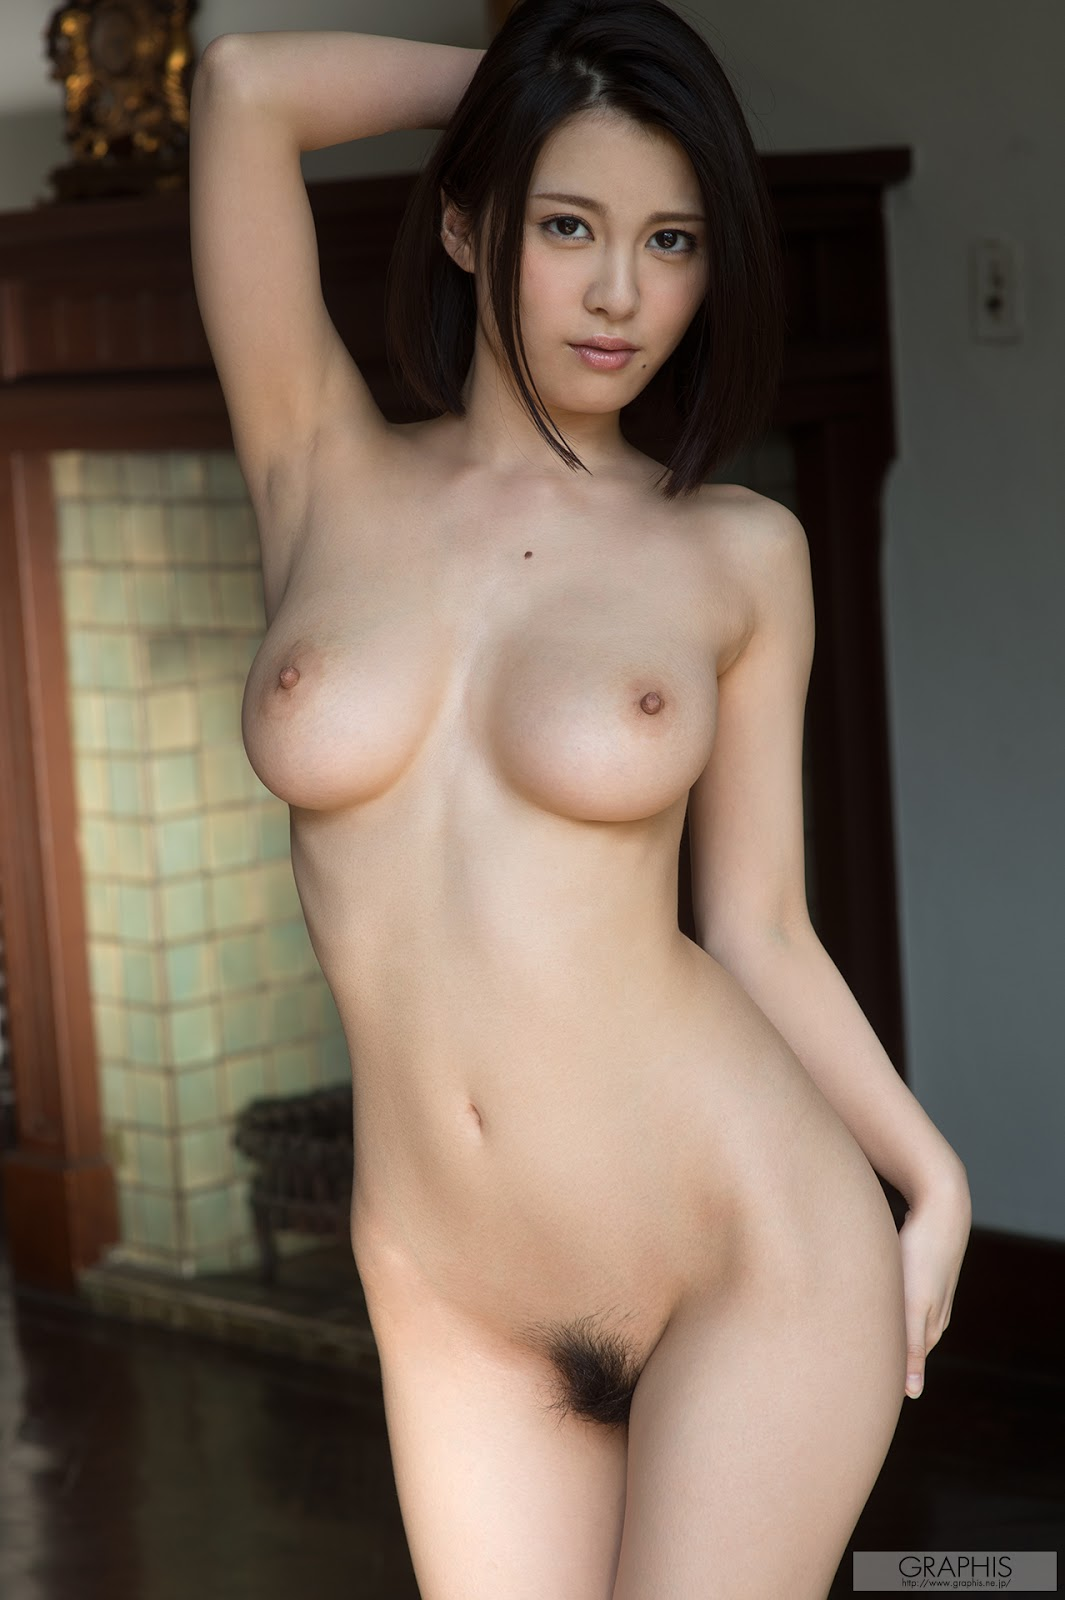 nude-female-china-actress-girl-pussy-photo-allahabad